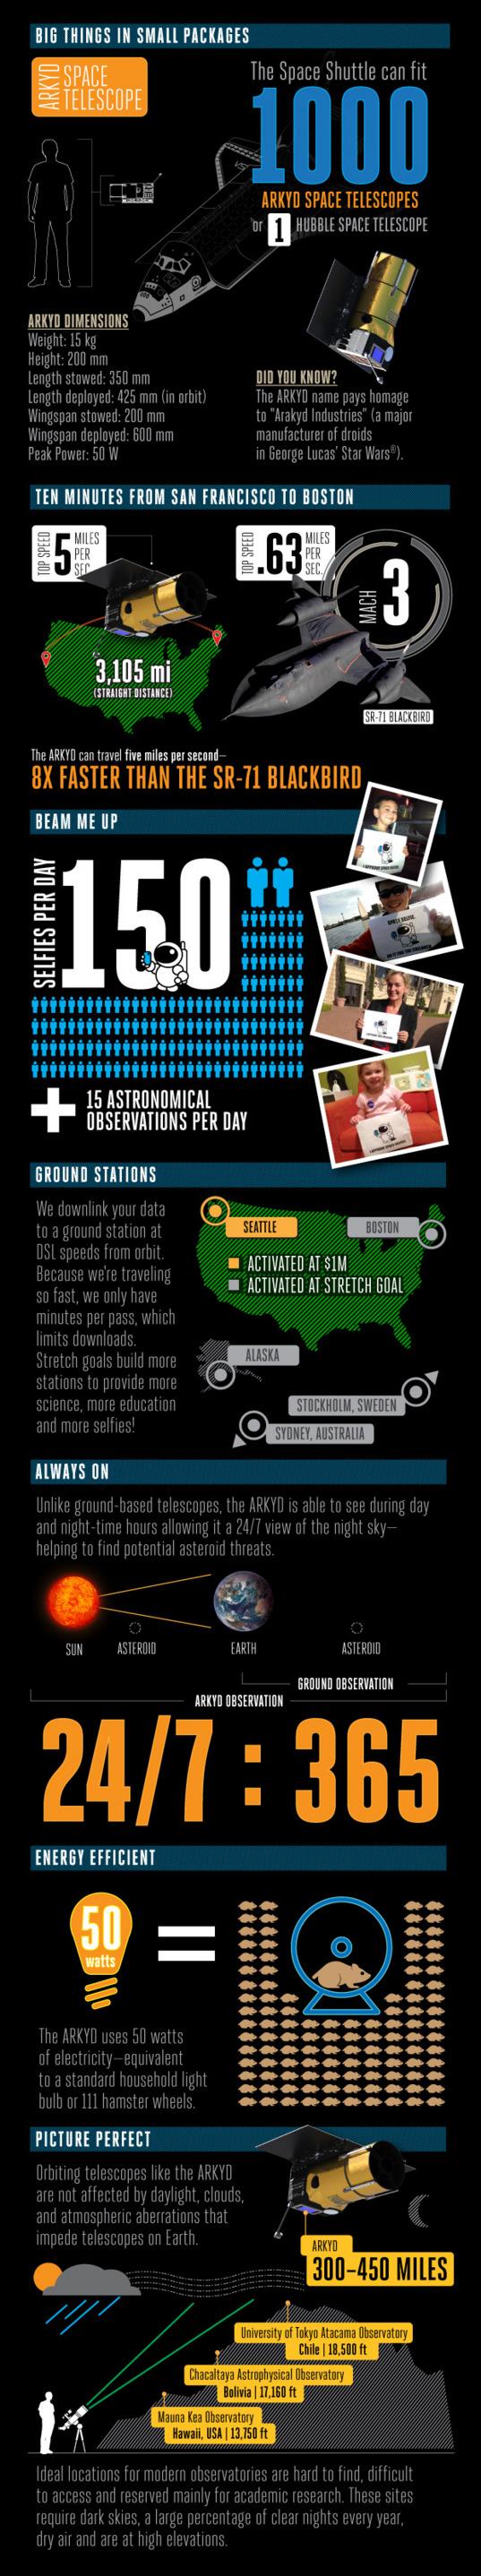 ARKYD Kickstarter infographic